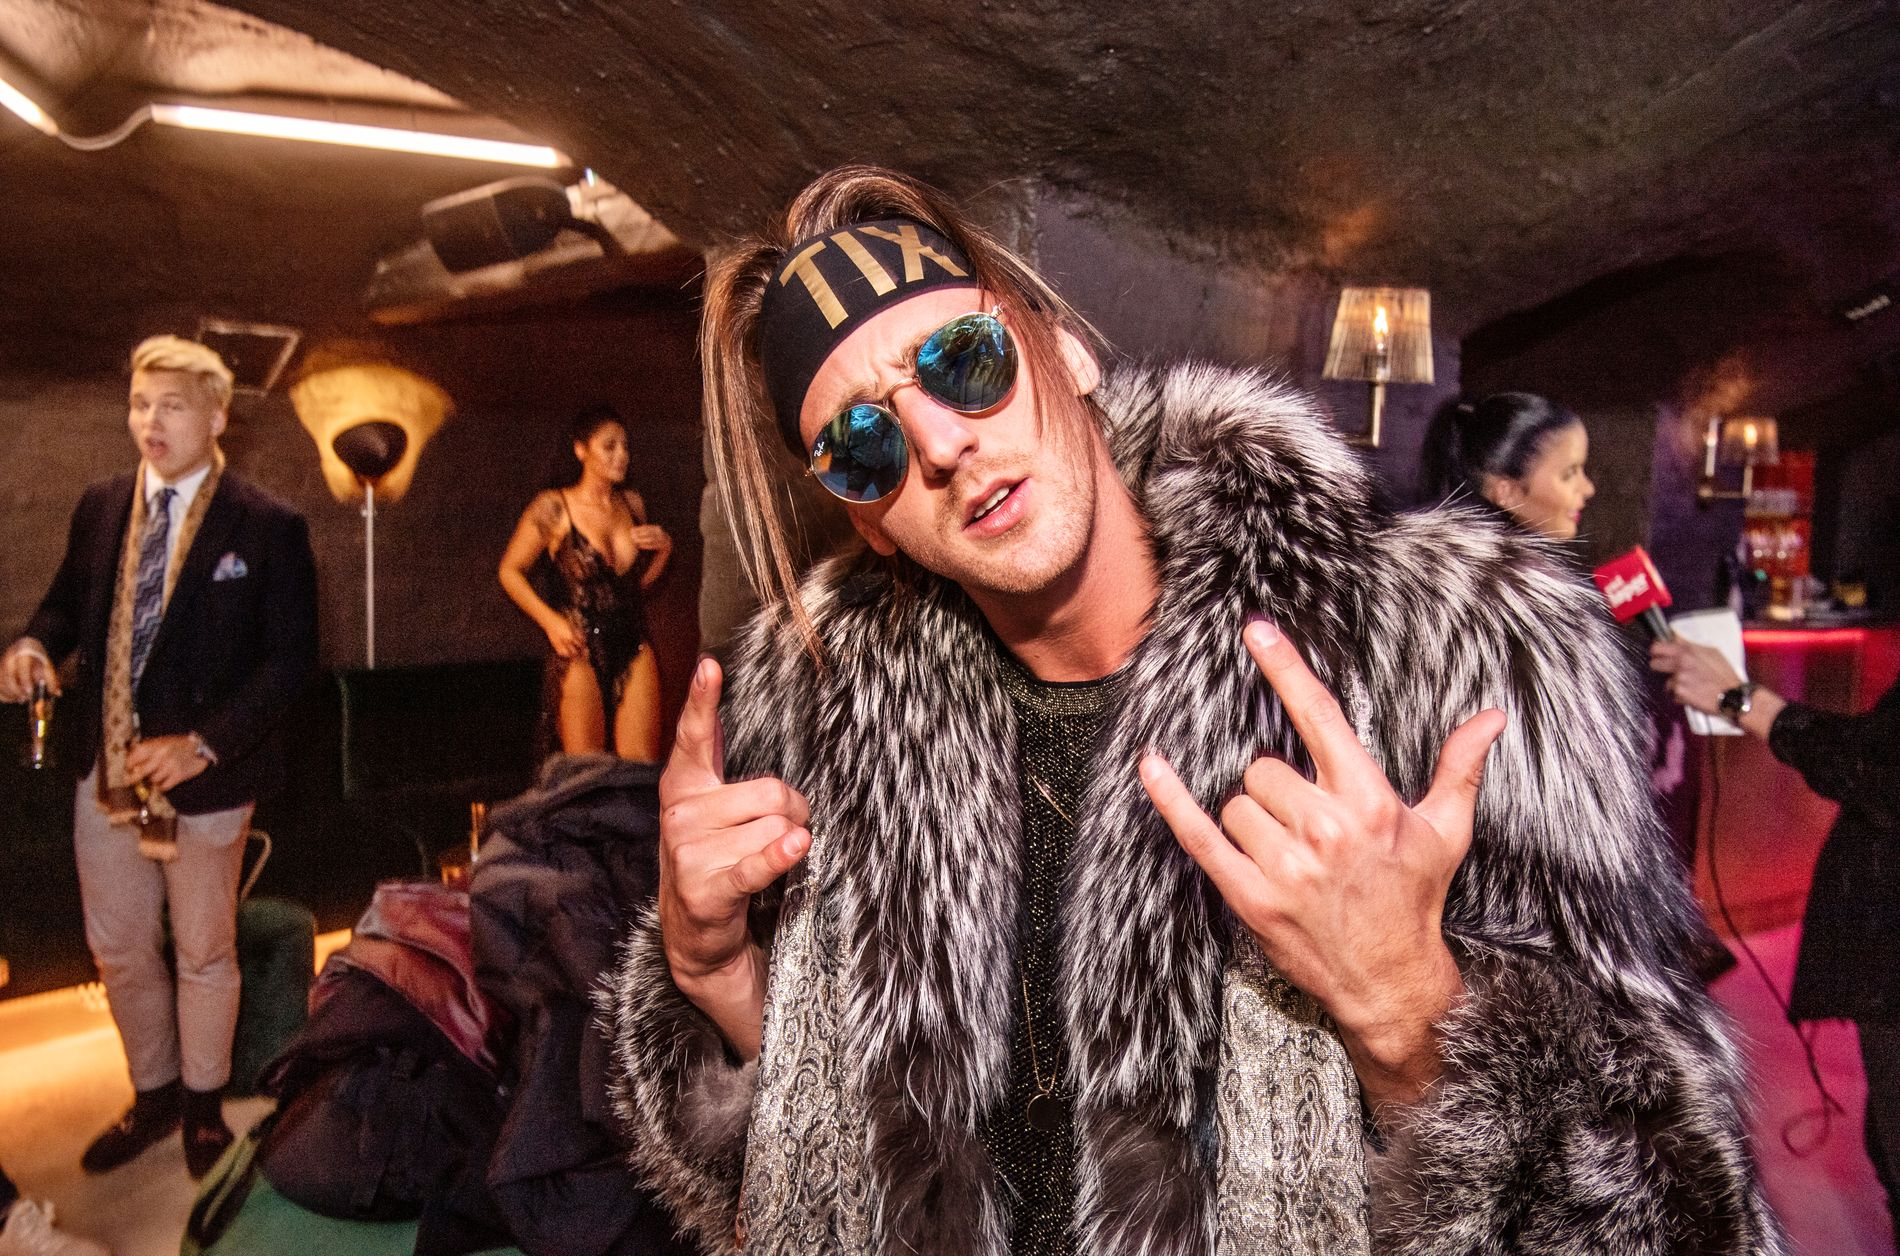 PREMIEREKLAR: Andreas «TIX» Haukeland var en selvsagt gjest på mandagens premierefest.